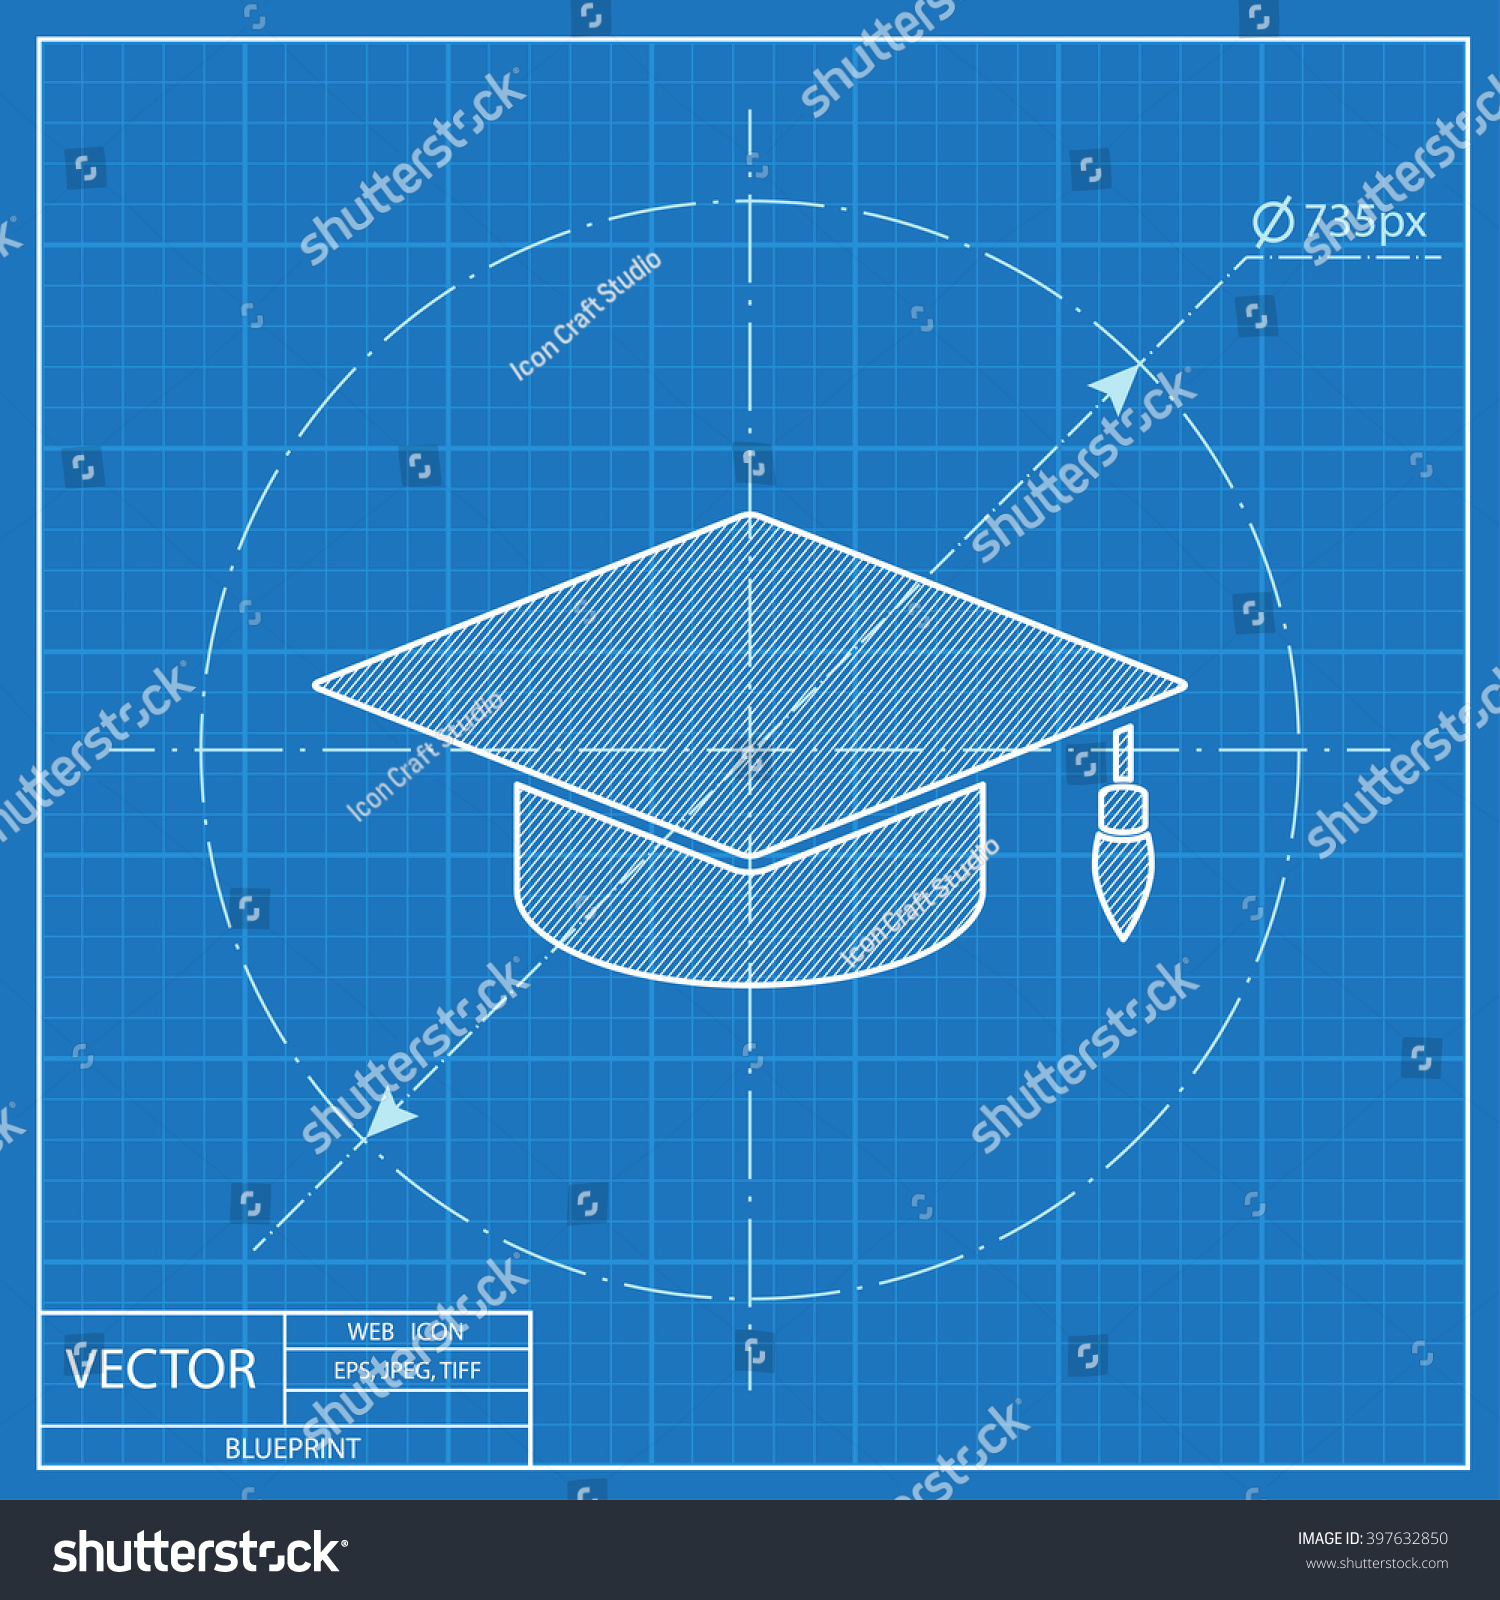 Academic hat vector blueprint icon vector de stock397632850 academic hat vector blueprint icon vector de stock397632850 shutterstock malvernweather Image collections